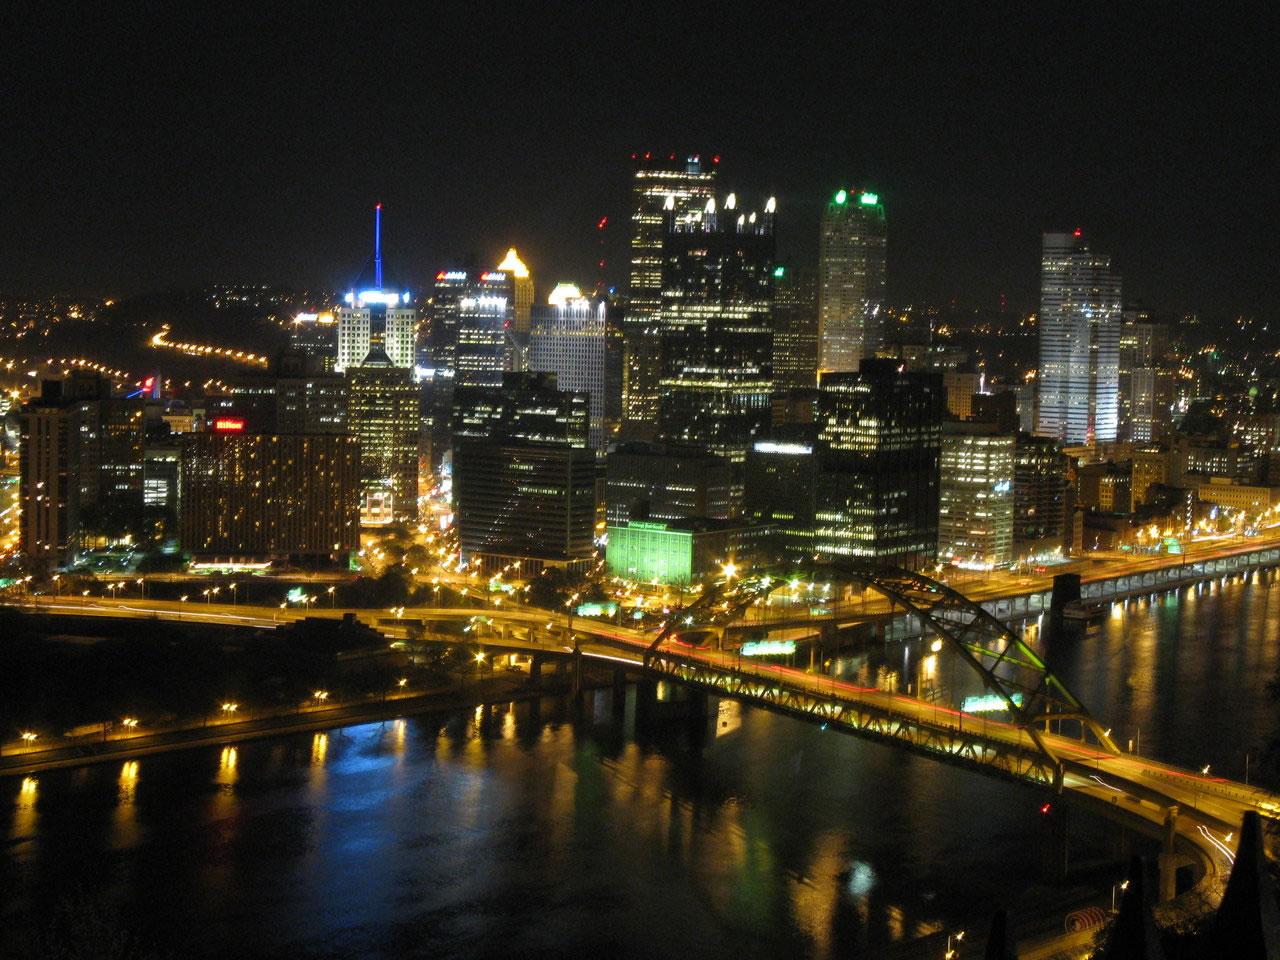 Windows Vista Wallpaper Pittsburgh Wallpaper 1280x960